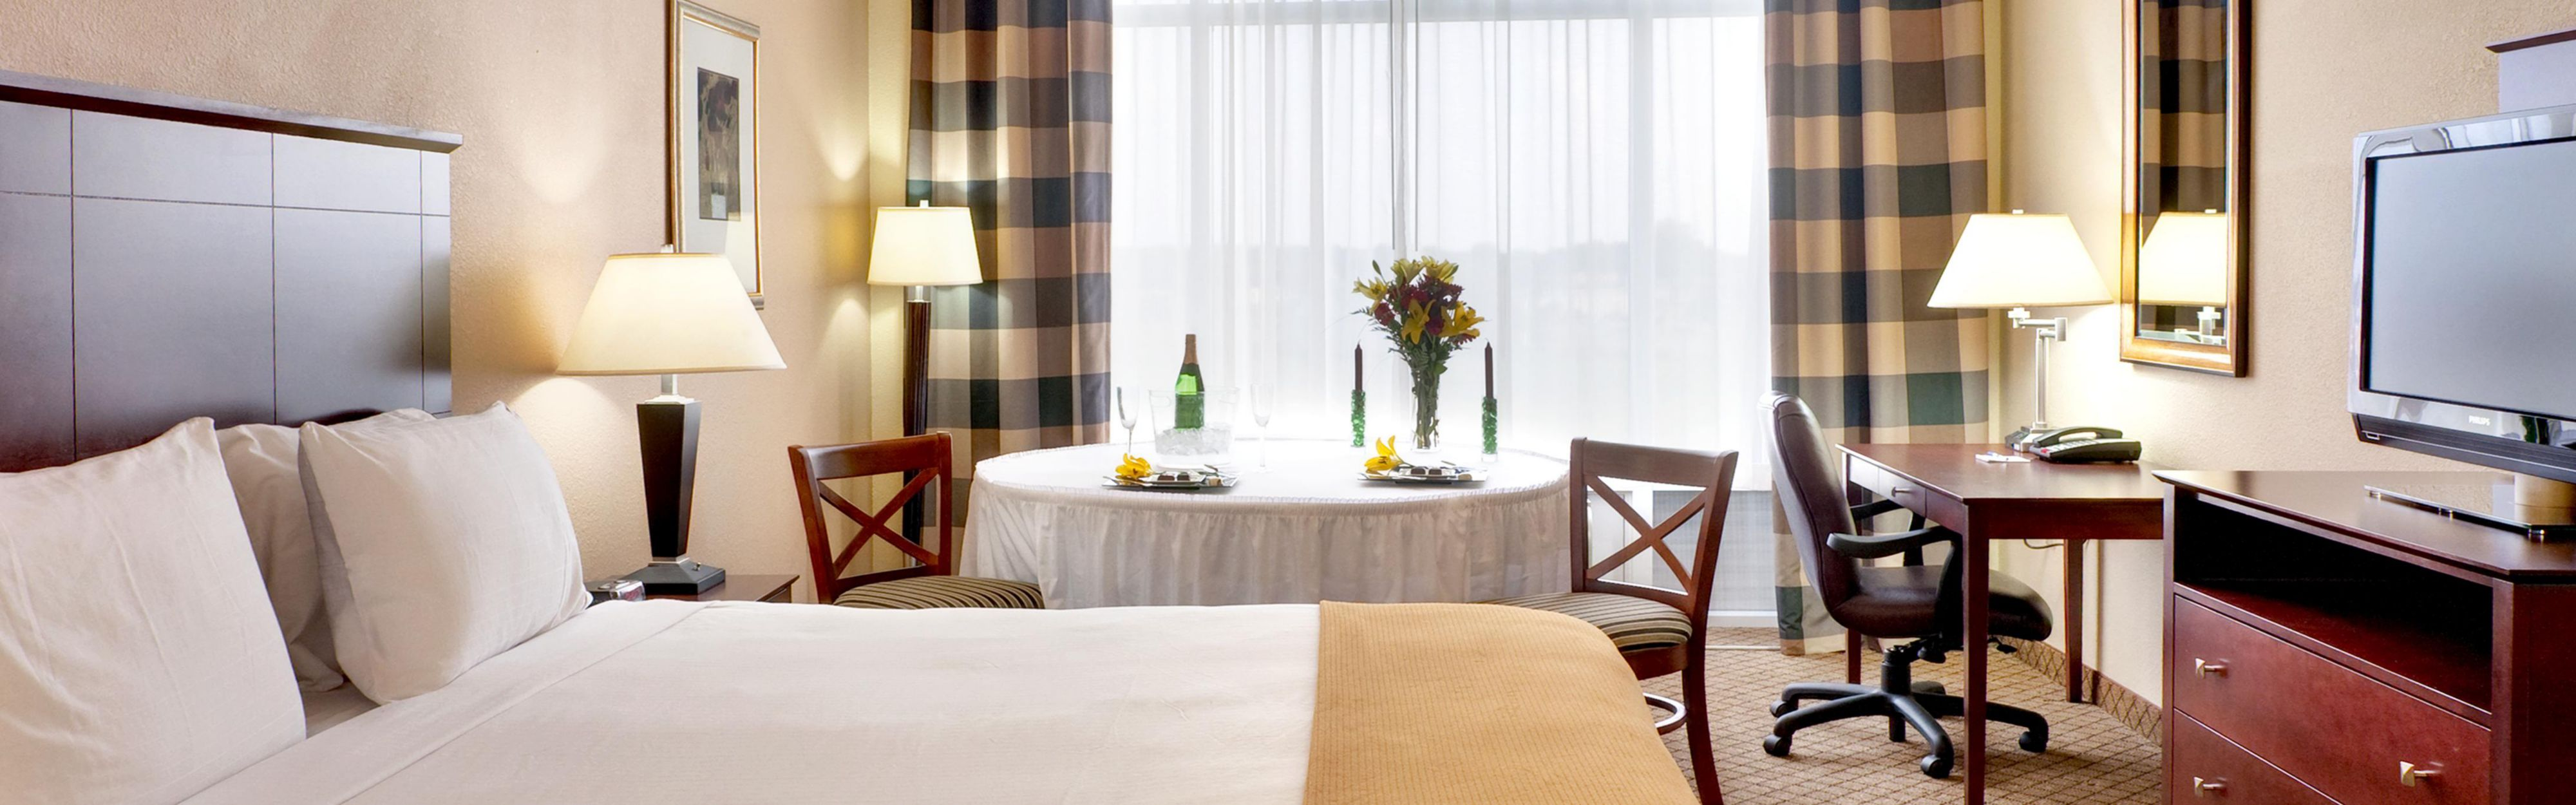 Holiday Inn Express Millington-Memphis Area image 1